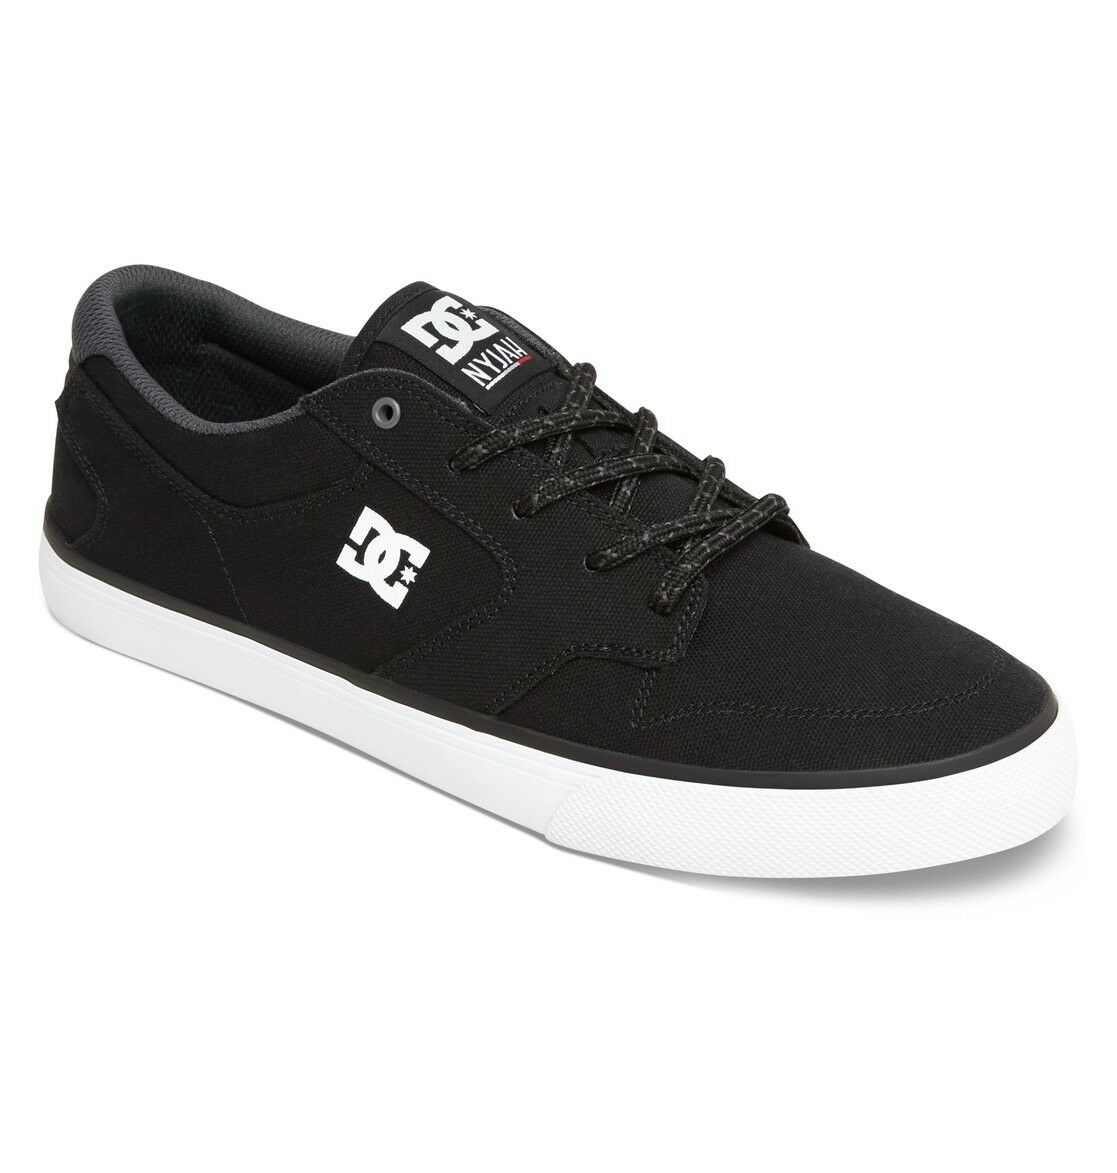 Neu DC Shoes Nyjah Vulc TX Sneakers Skaterschuhe Turnschuhe schwarz